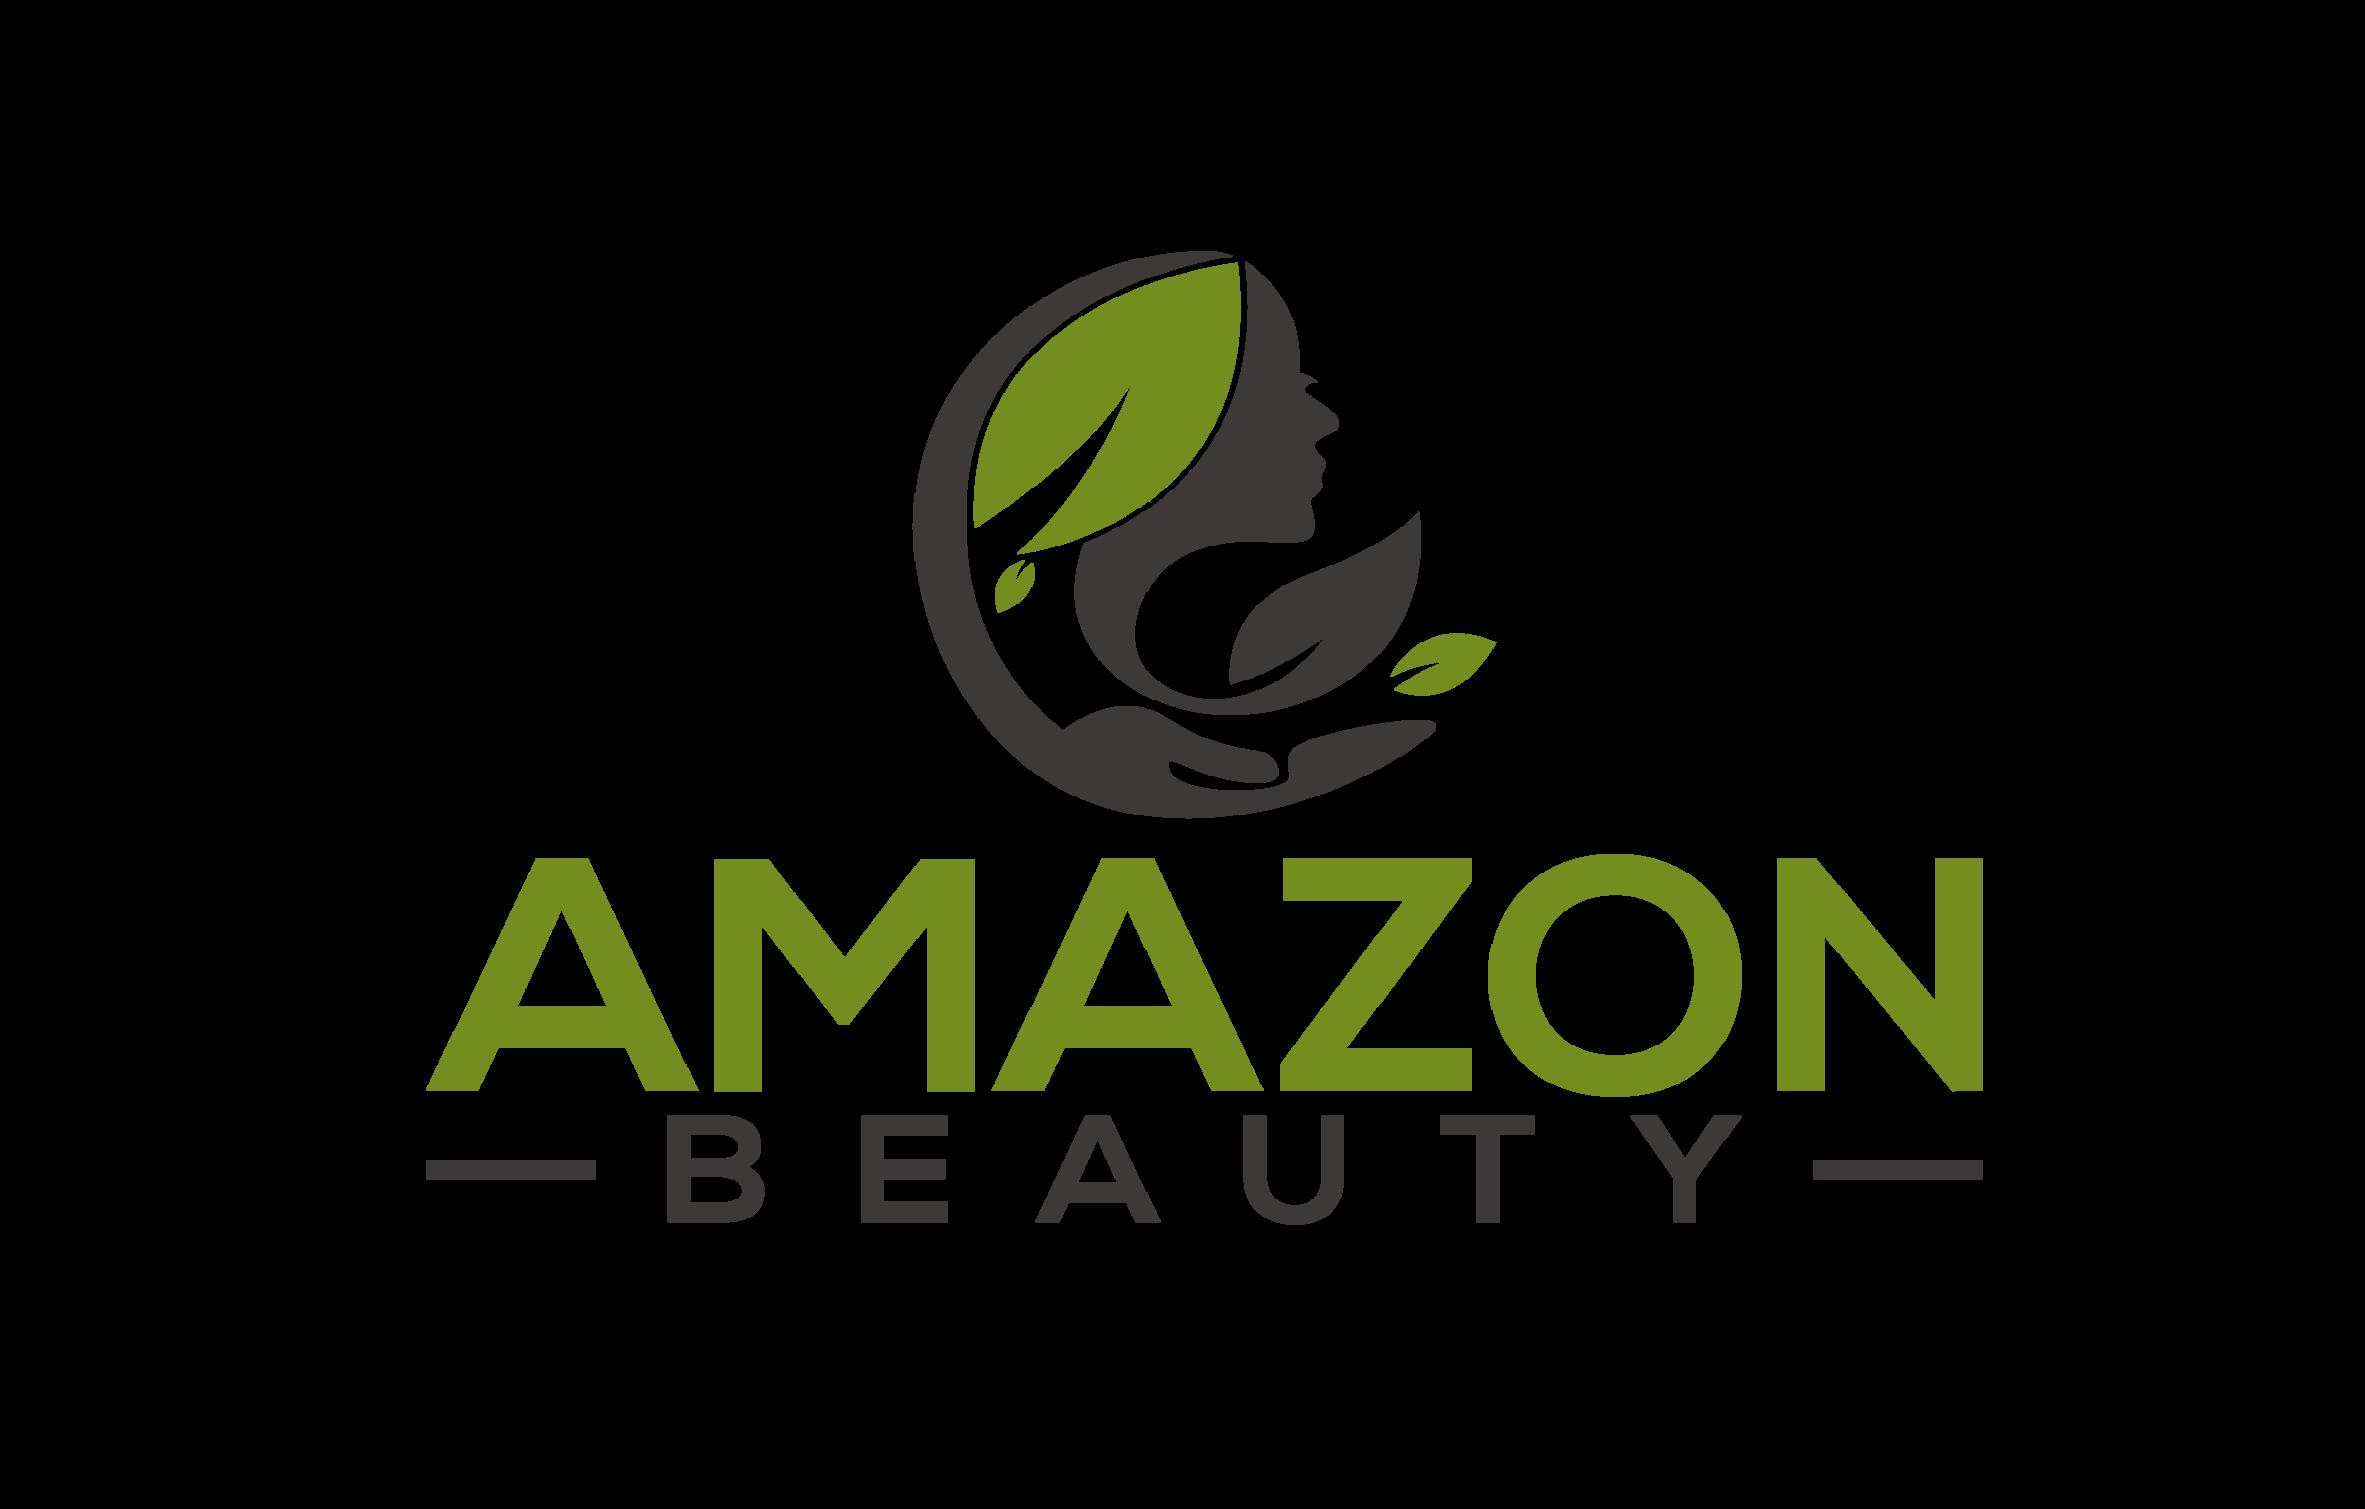 Amazonbeauty